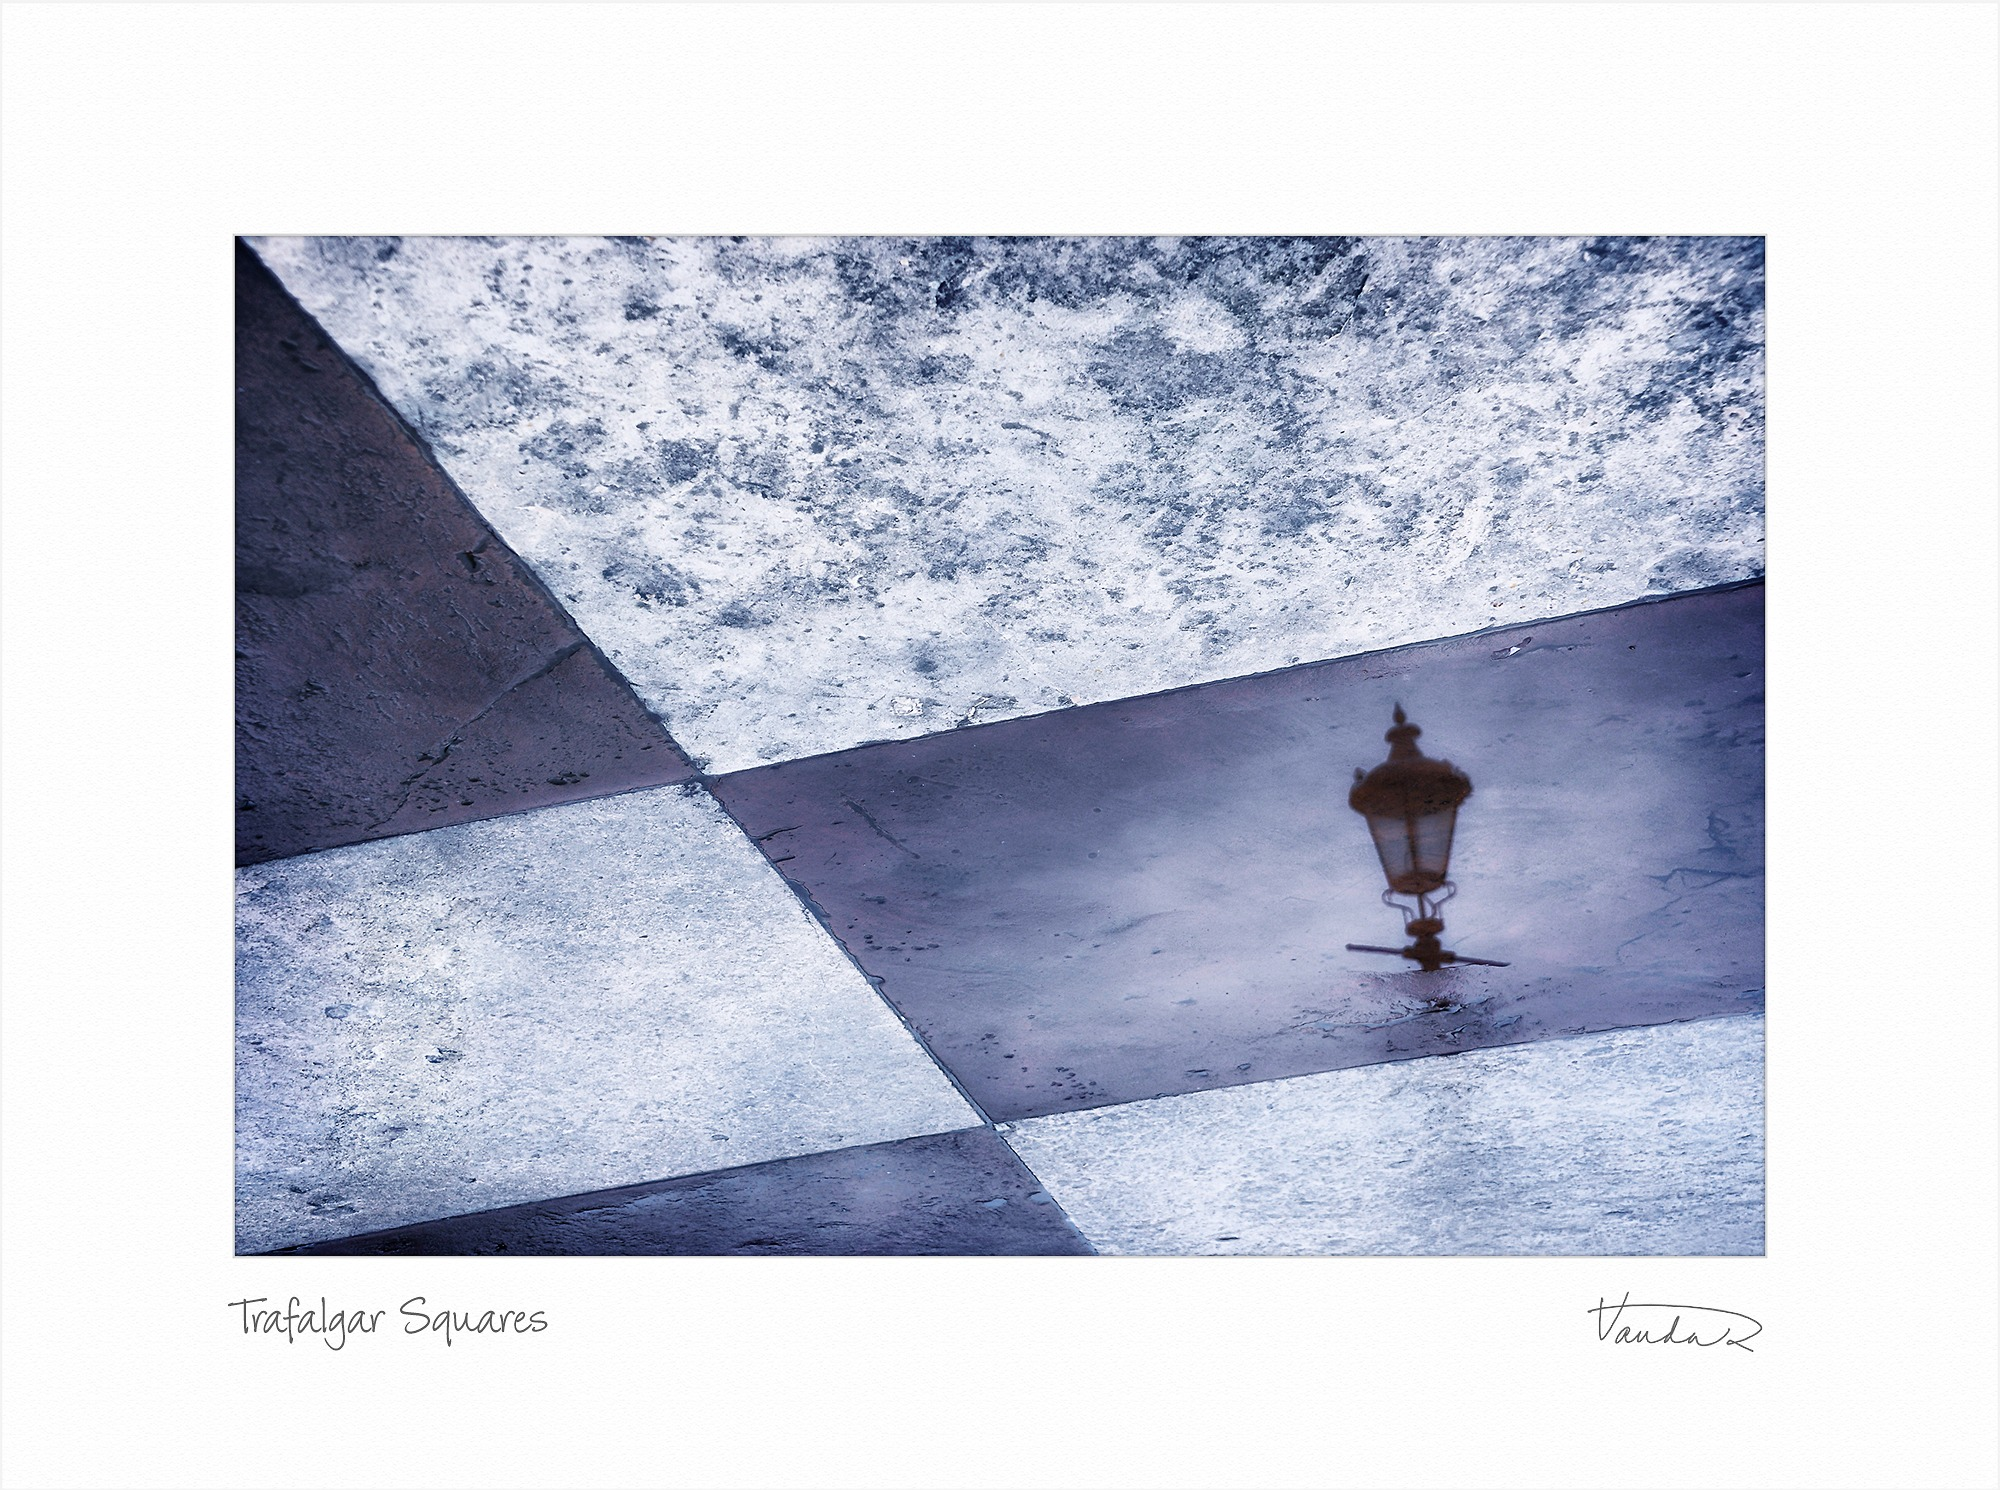 Trafalgar Squares